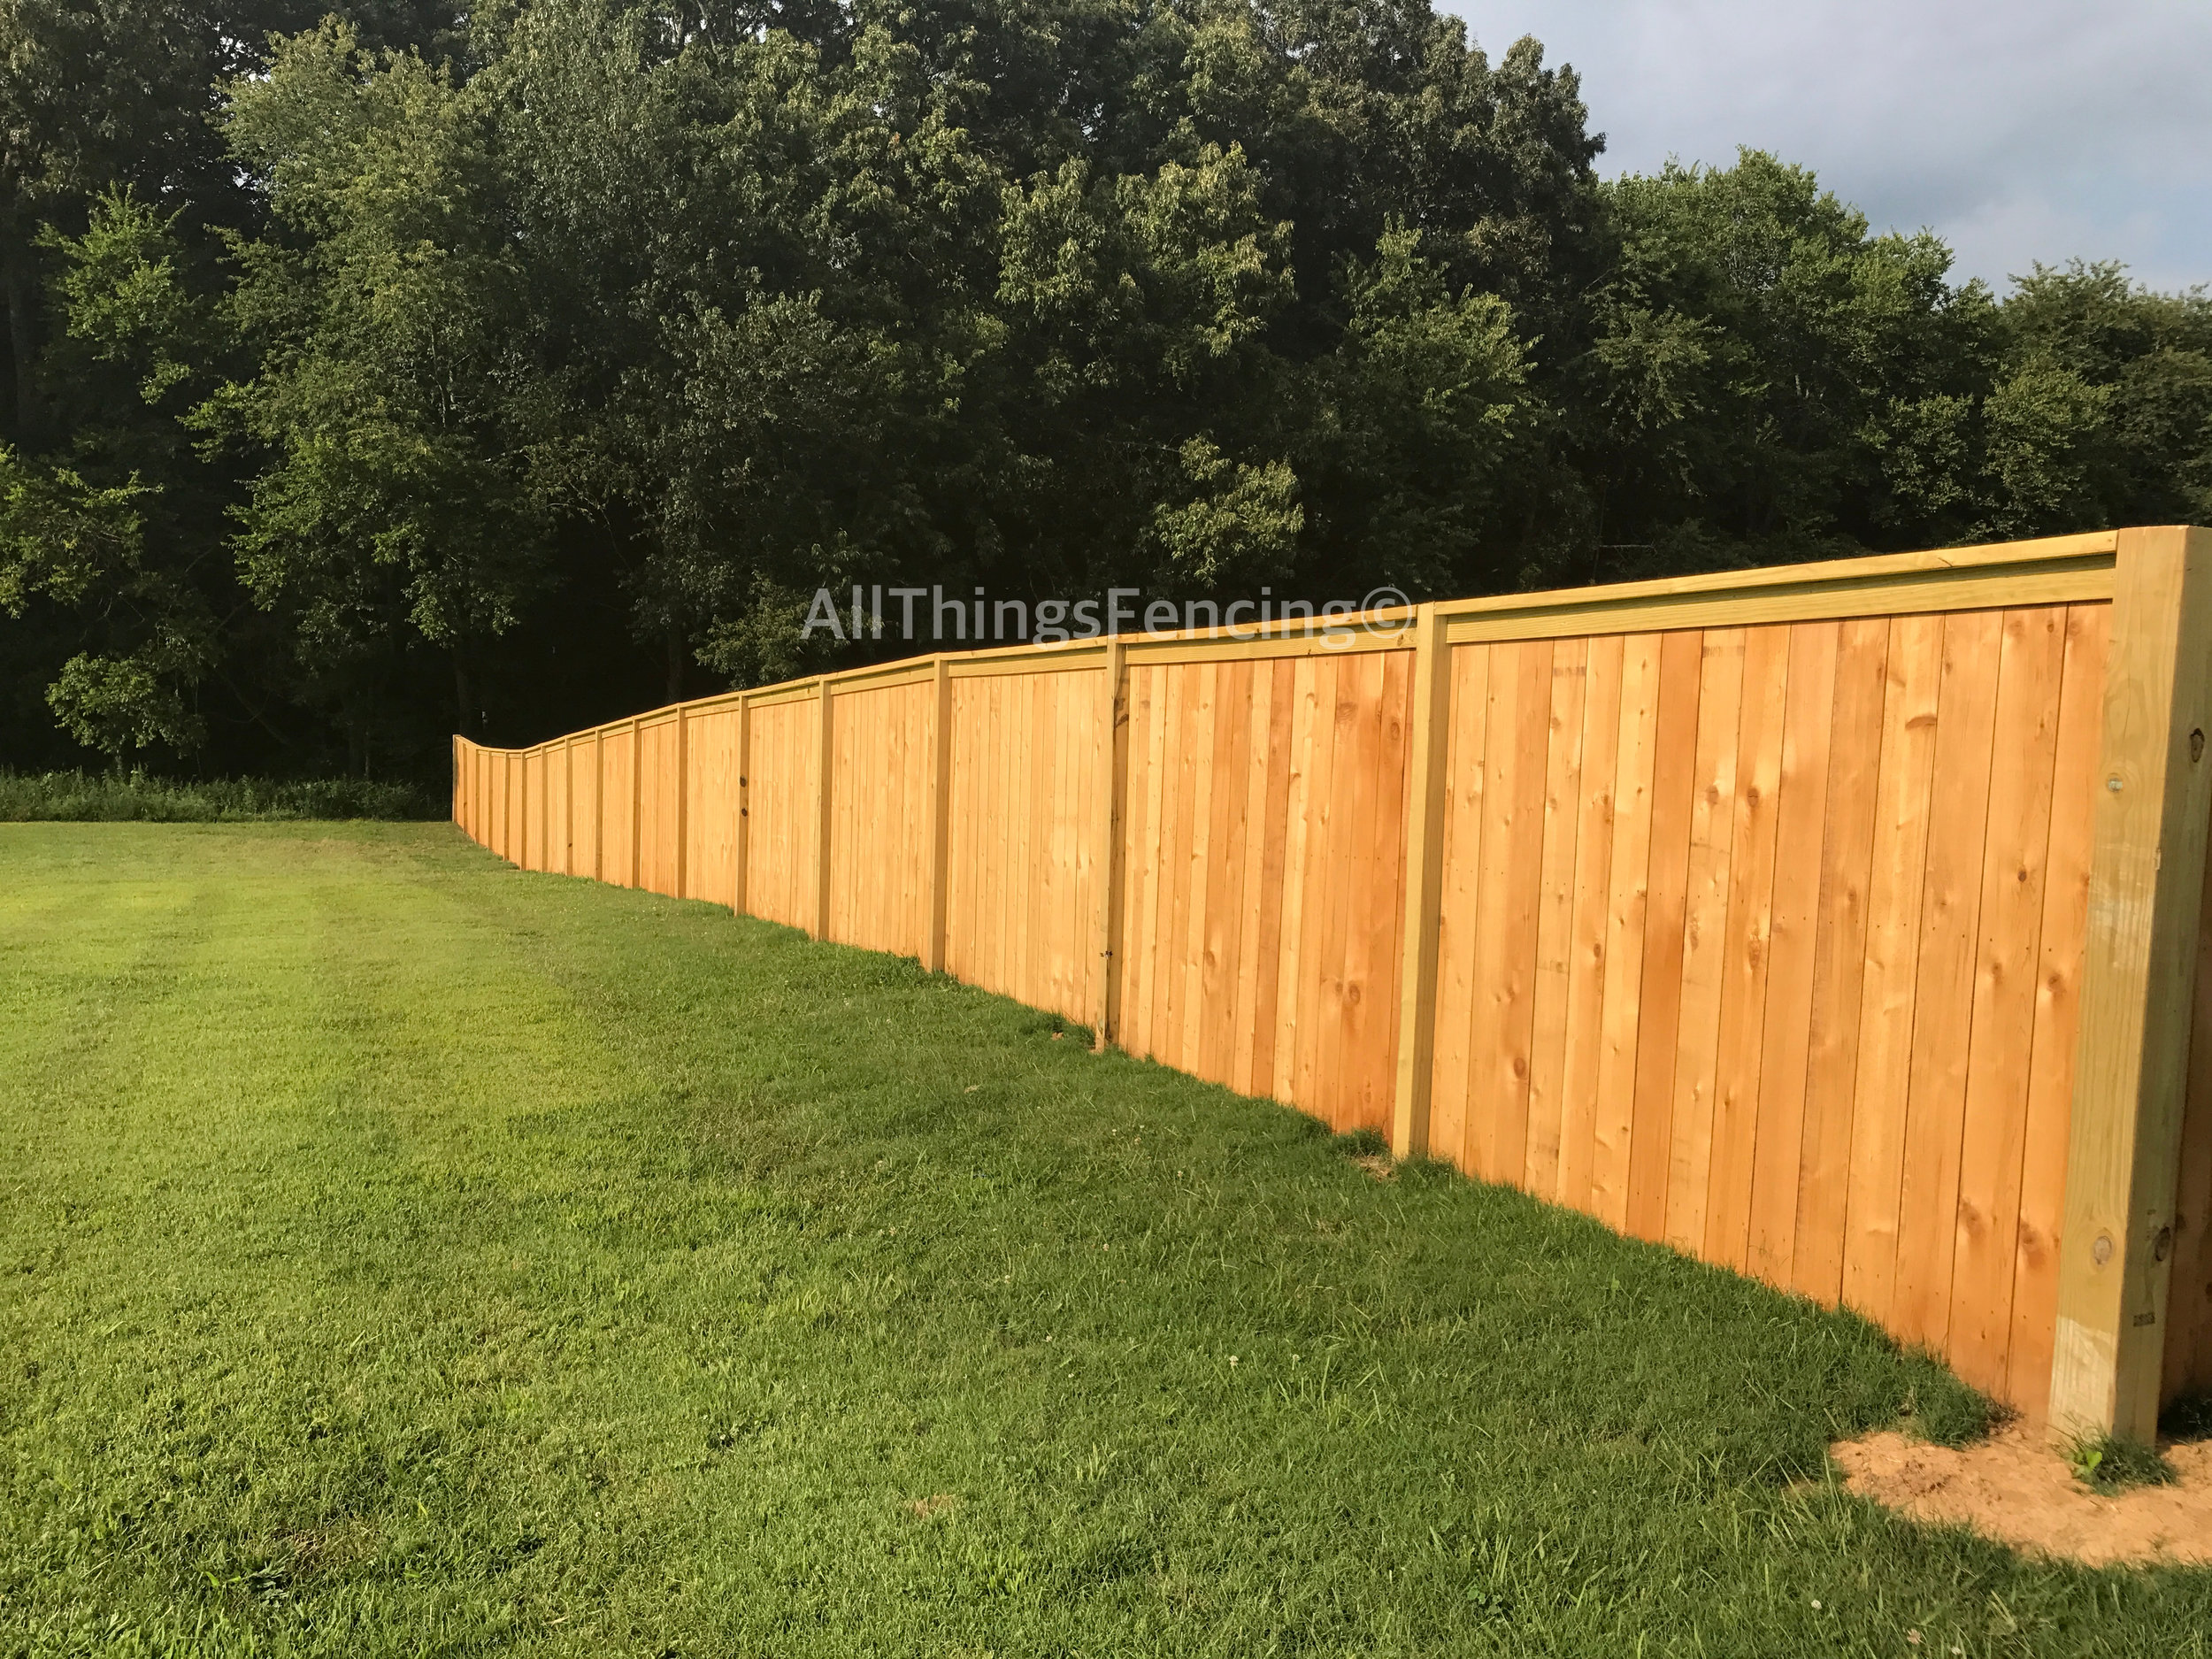 *Fence displayed is cedar.